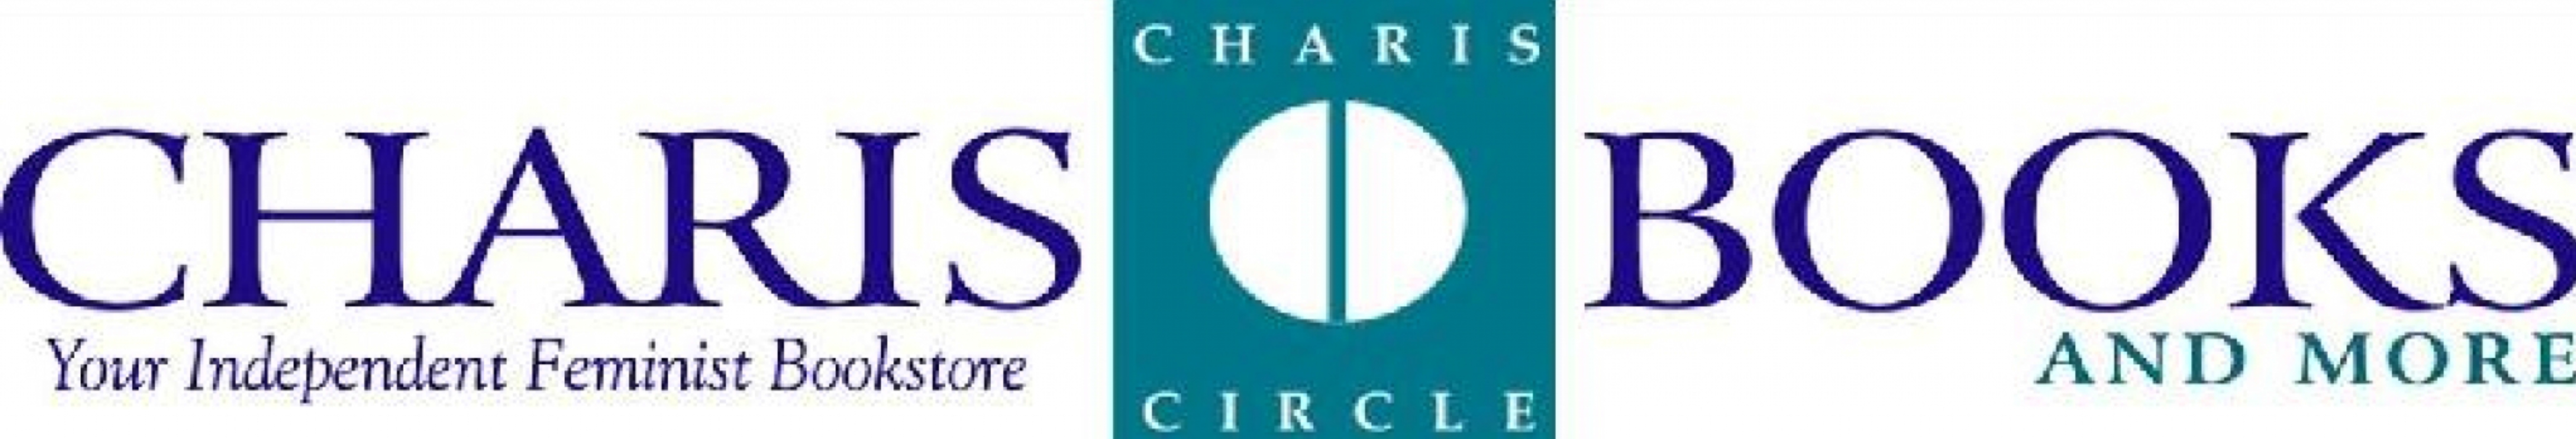 charisbooks-circle